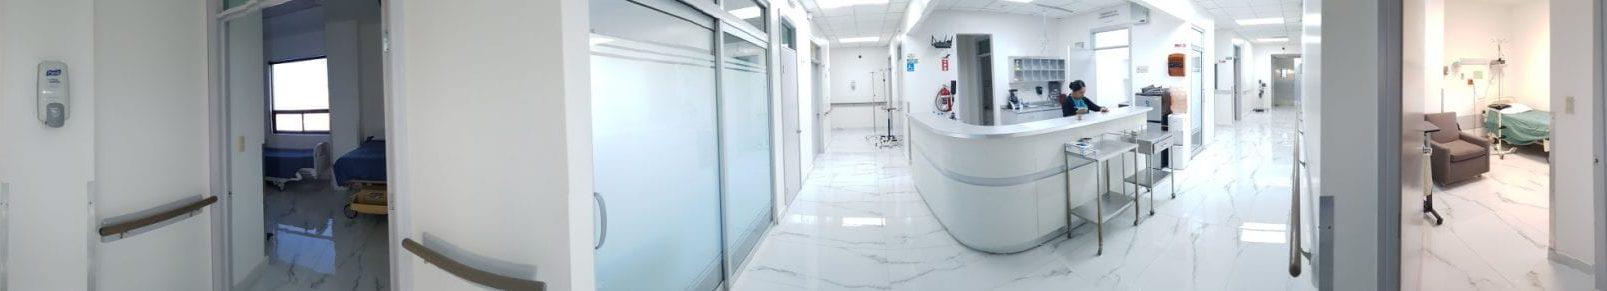 Mexico Bariatric Surgery Center at Mi Doctor Hospital